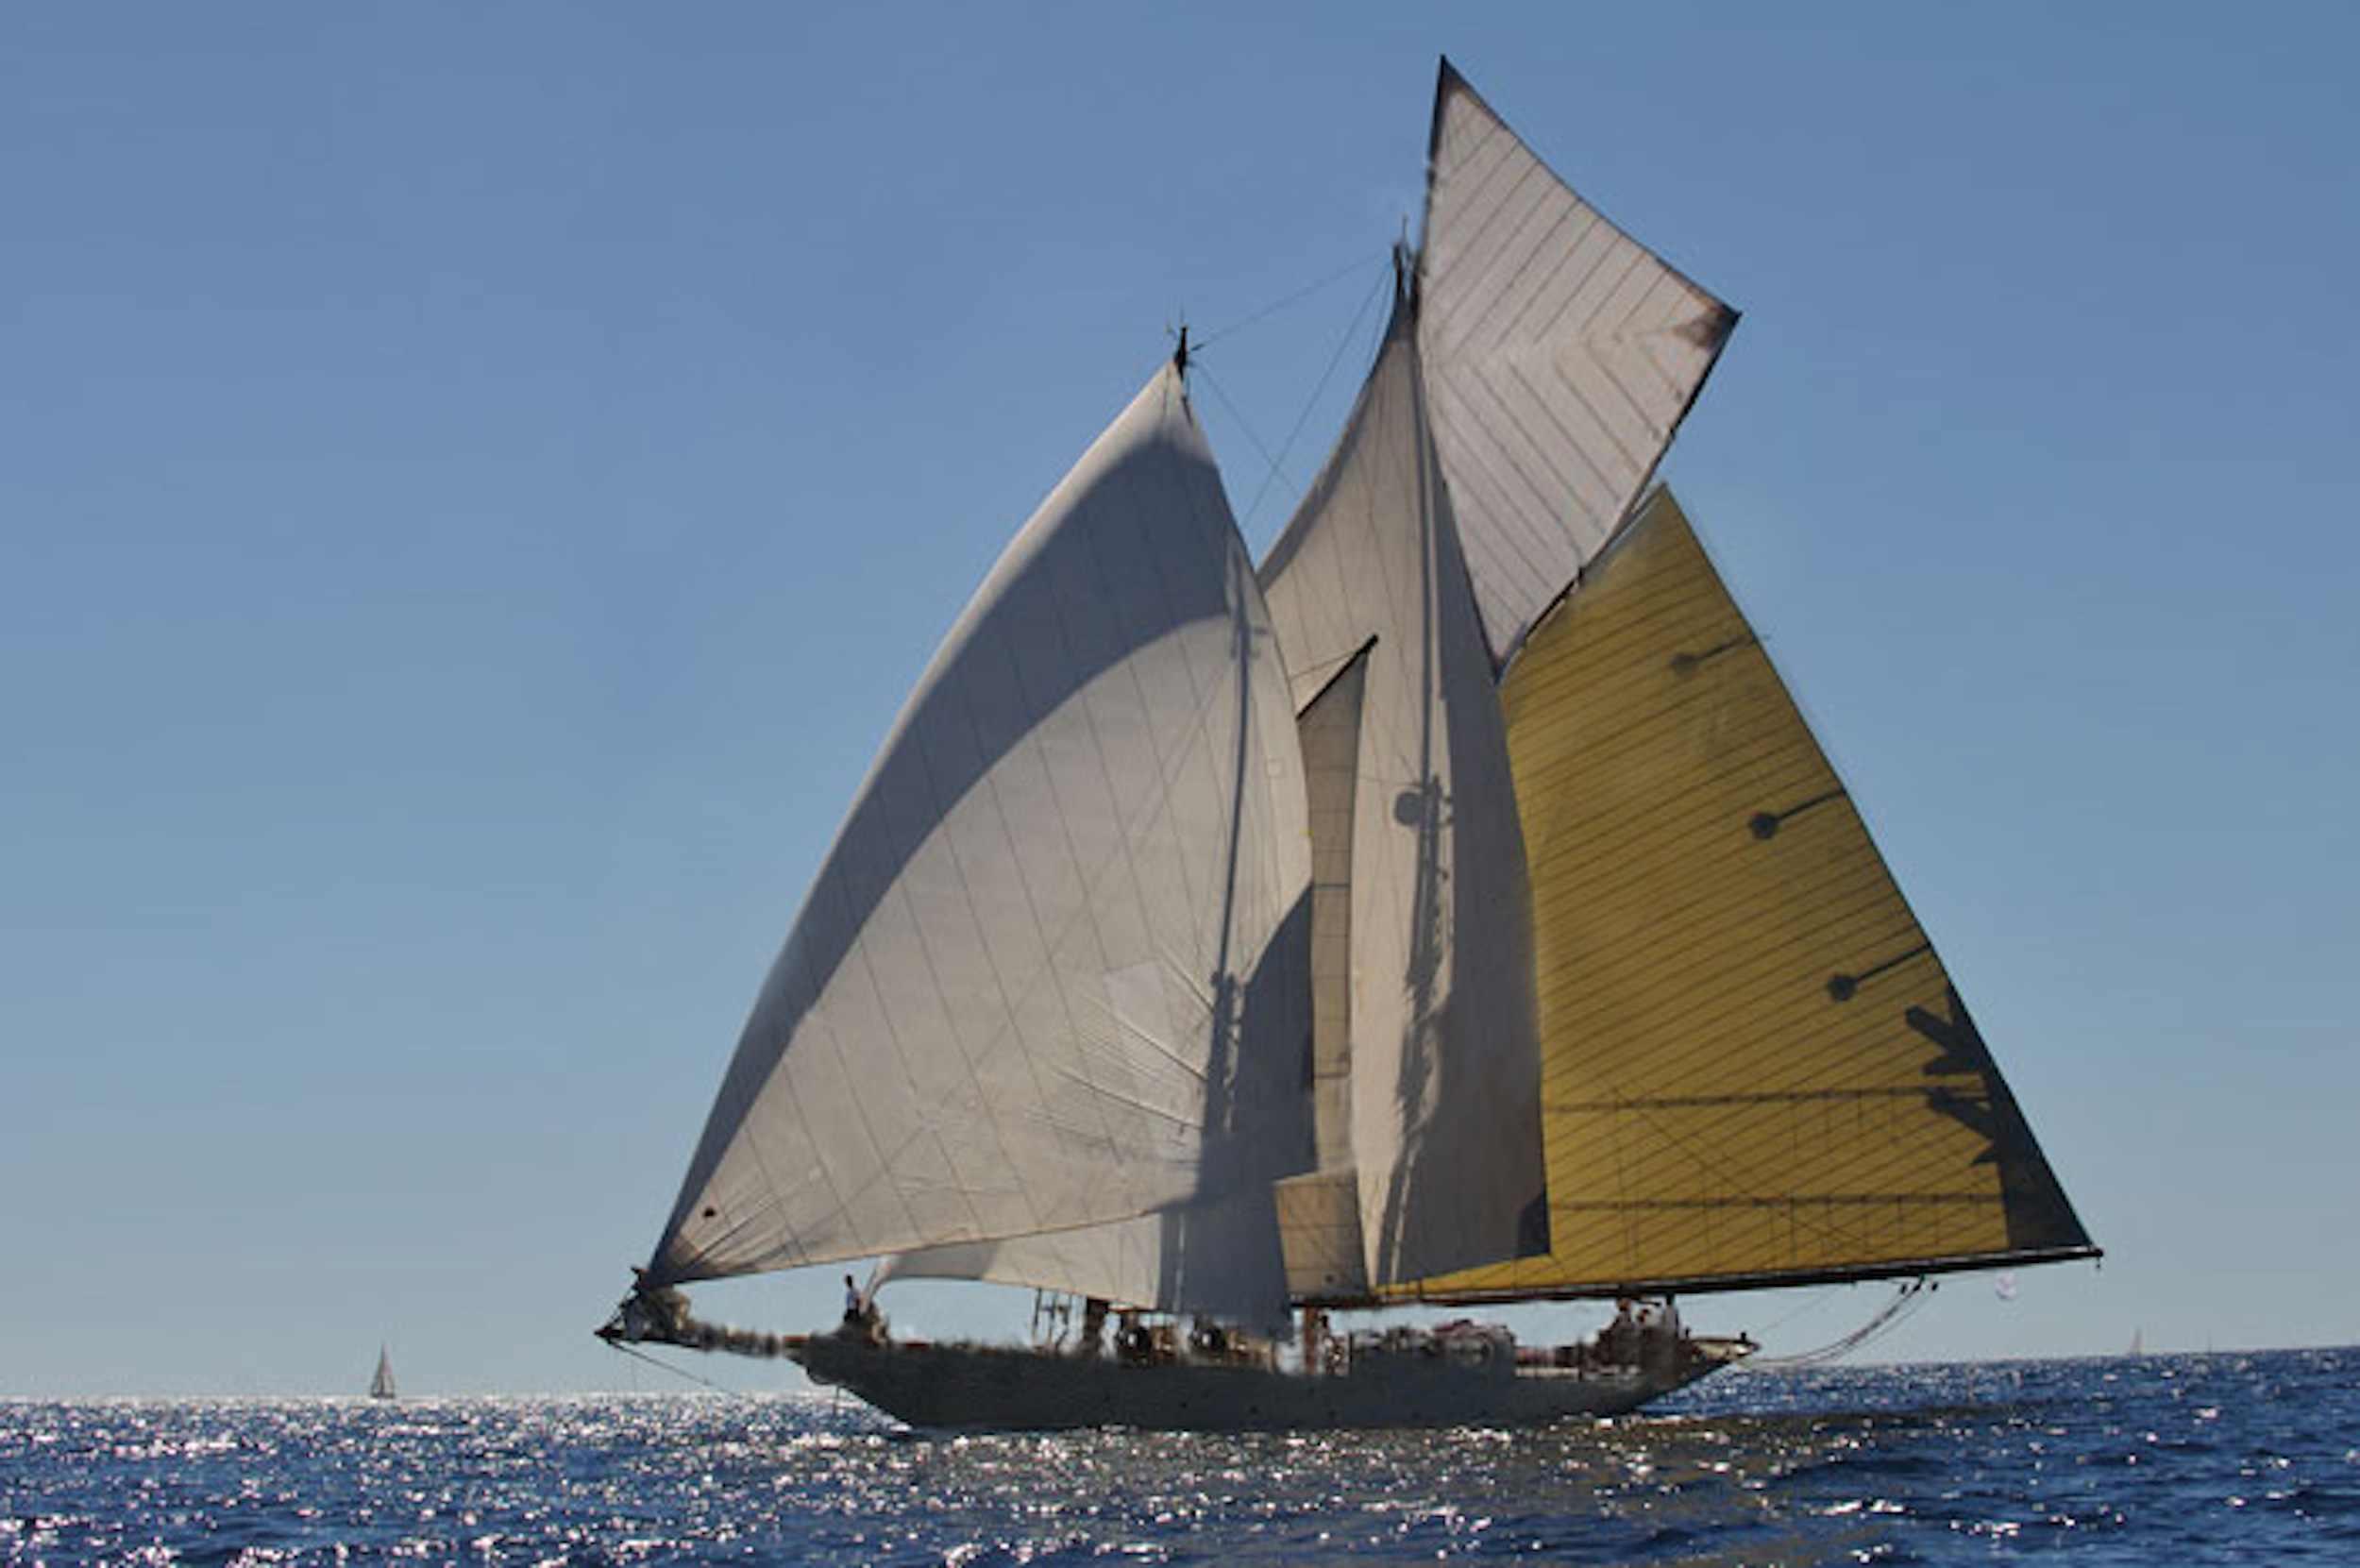 Sunshine yacht charter islands beaches Myanmar Mergui Myeik.jpg